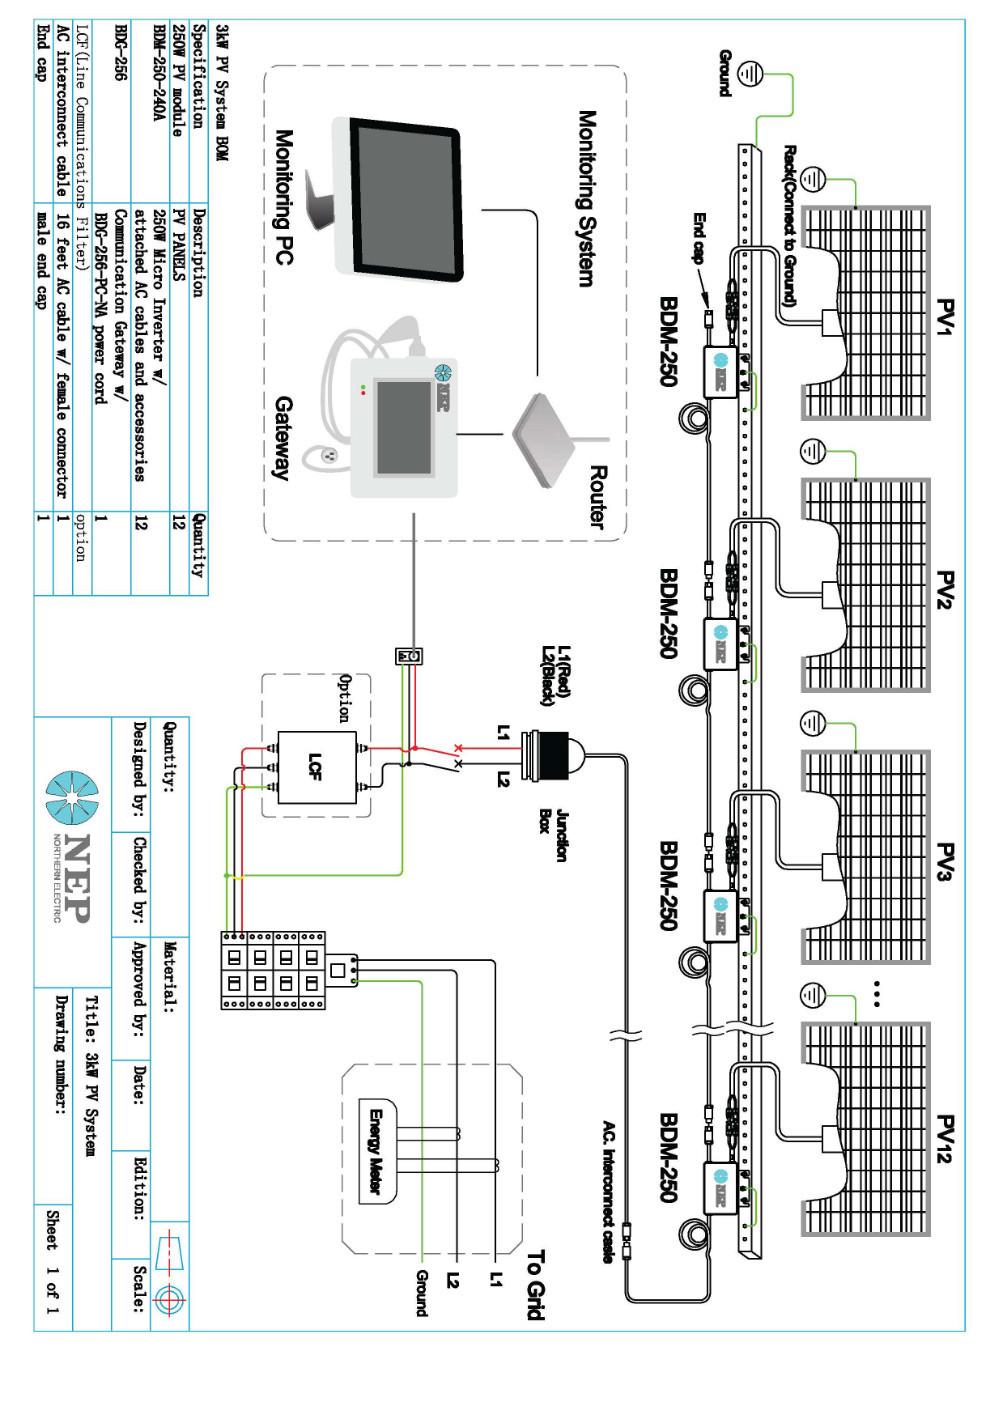 pv combiner box wiring diagram pdf wiring circuit \u2022 hardware wiring  diagram combiner box wiring diagram